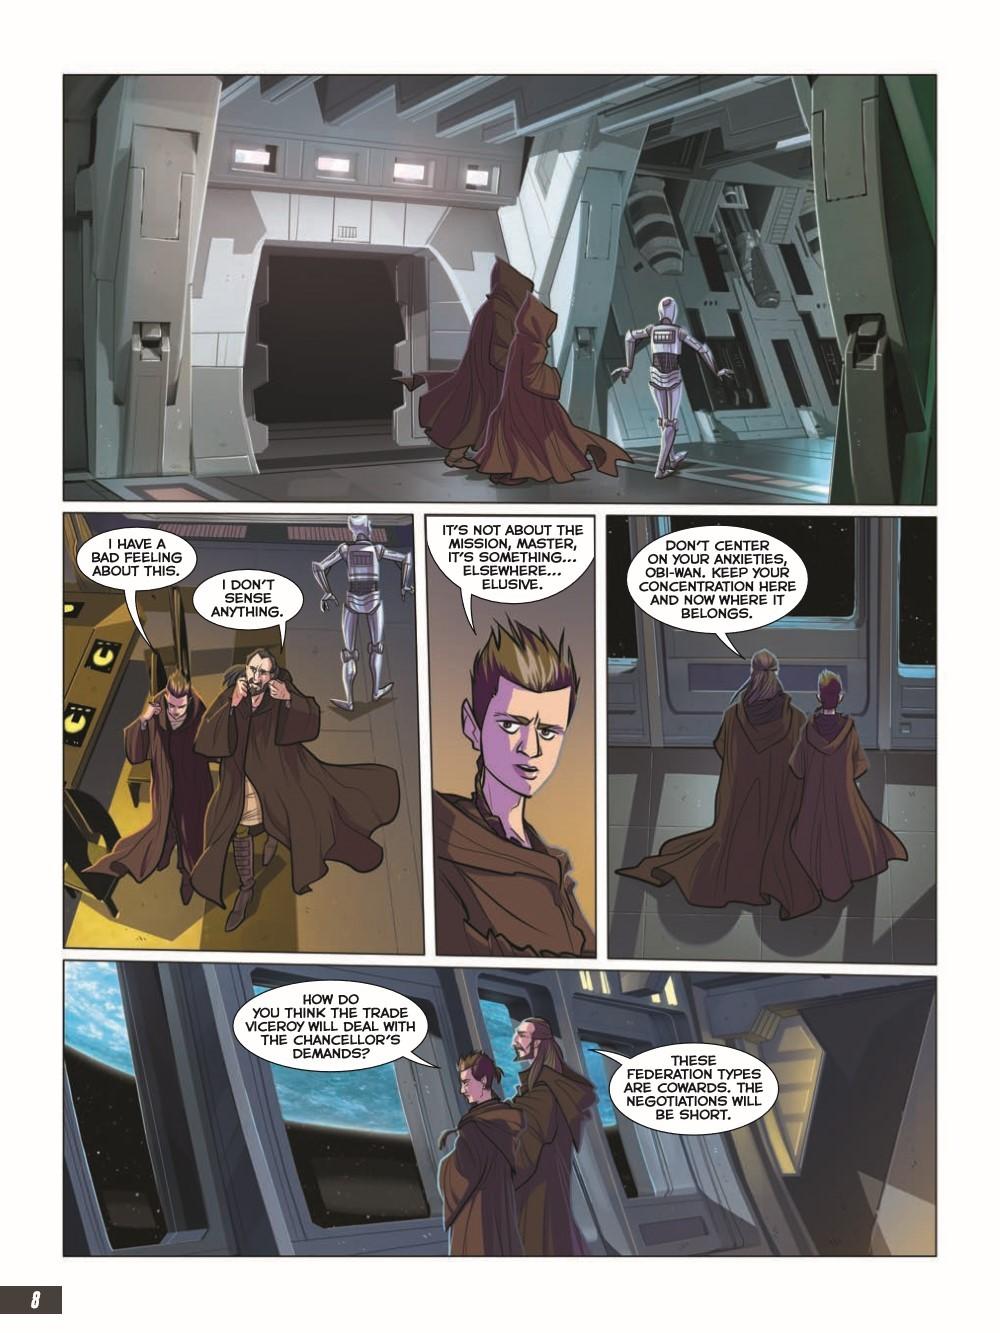 SW_The-Phantom-Menace_pr-4 ComicList Previews: STAR WARS THE PHANTOM MENACE GRAPHIC NOVEL ADAPTATION GN